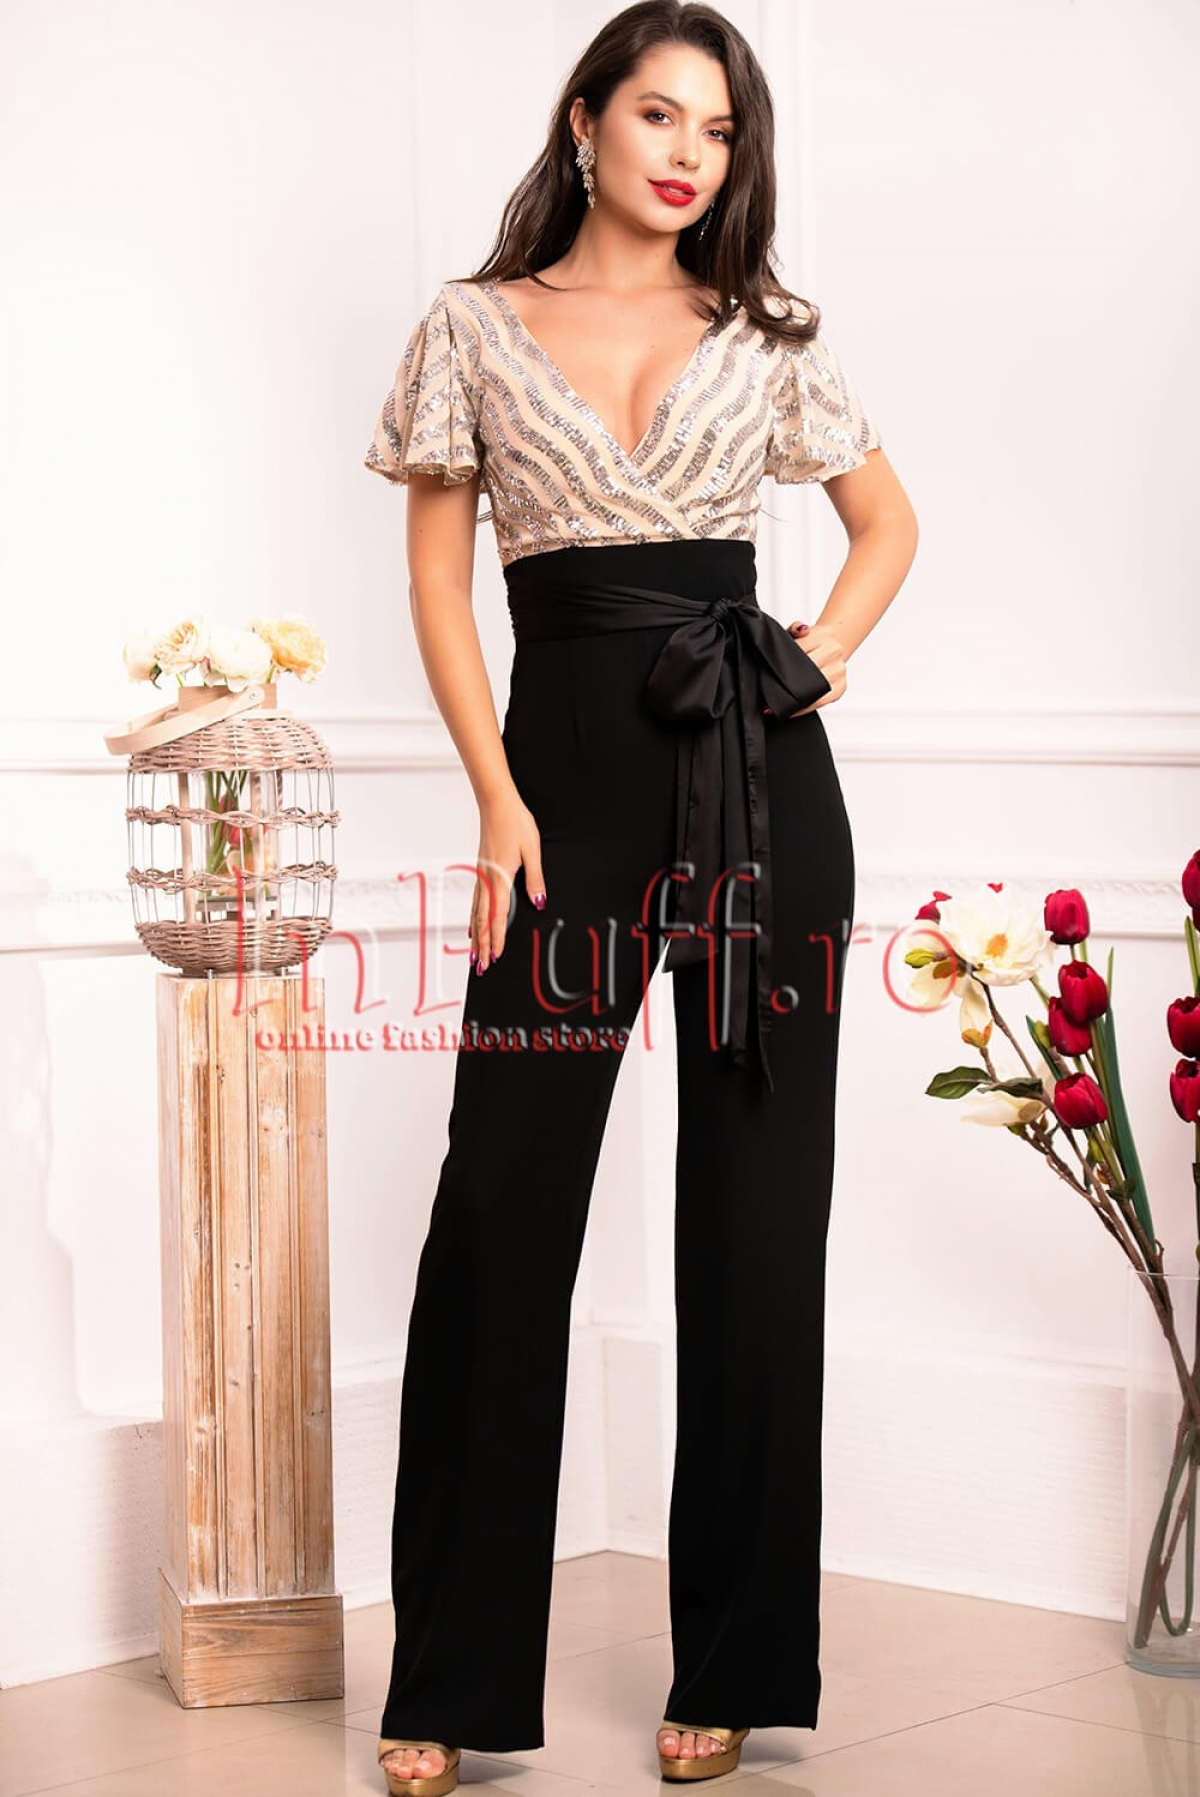 Salopeta moderna cu paiete argintii si pantalon negru